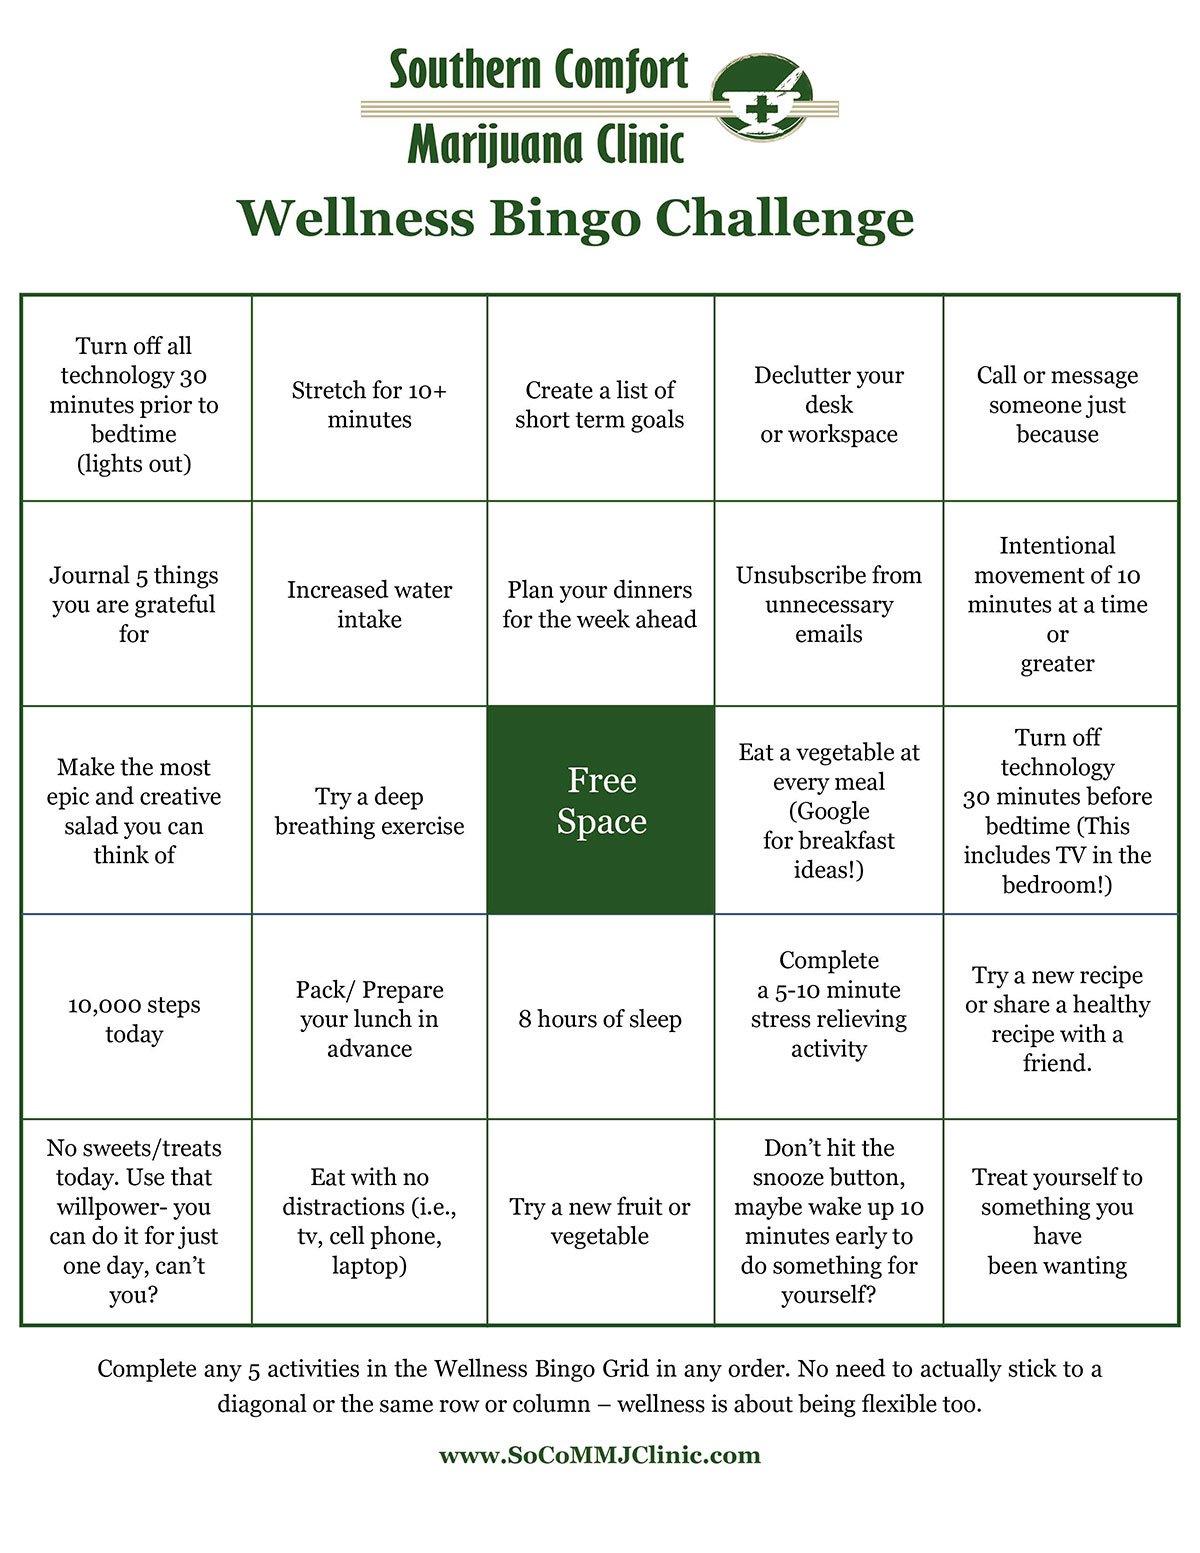 card for wellness bingo